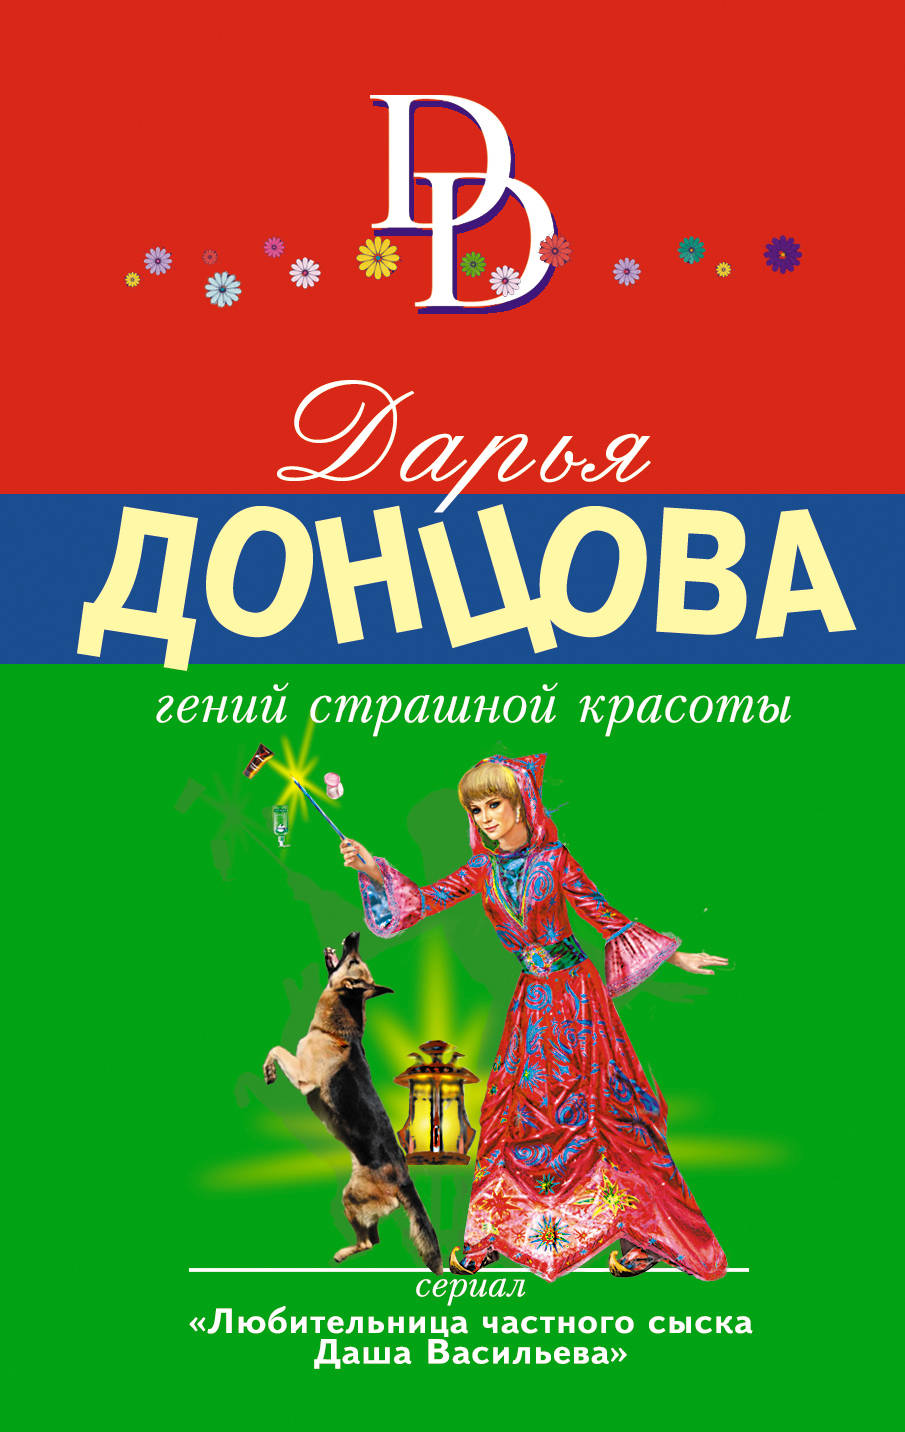 Донцова Дарья Аркадьевна Гений страшной красоты ISBN: 978-5-04-094182-7